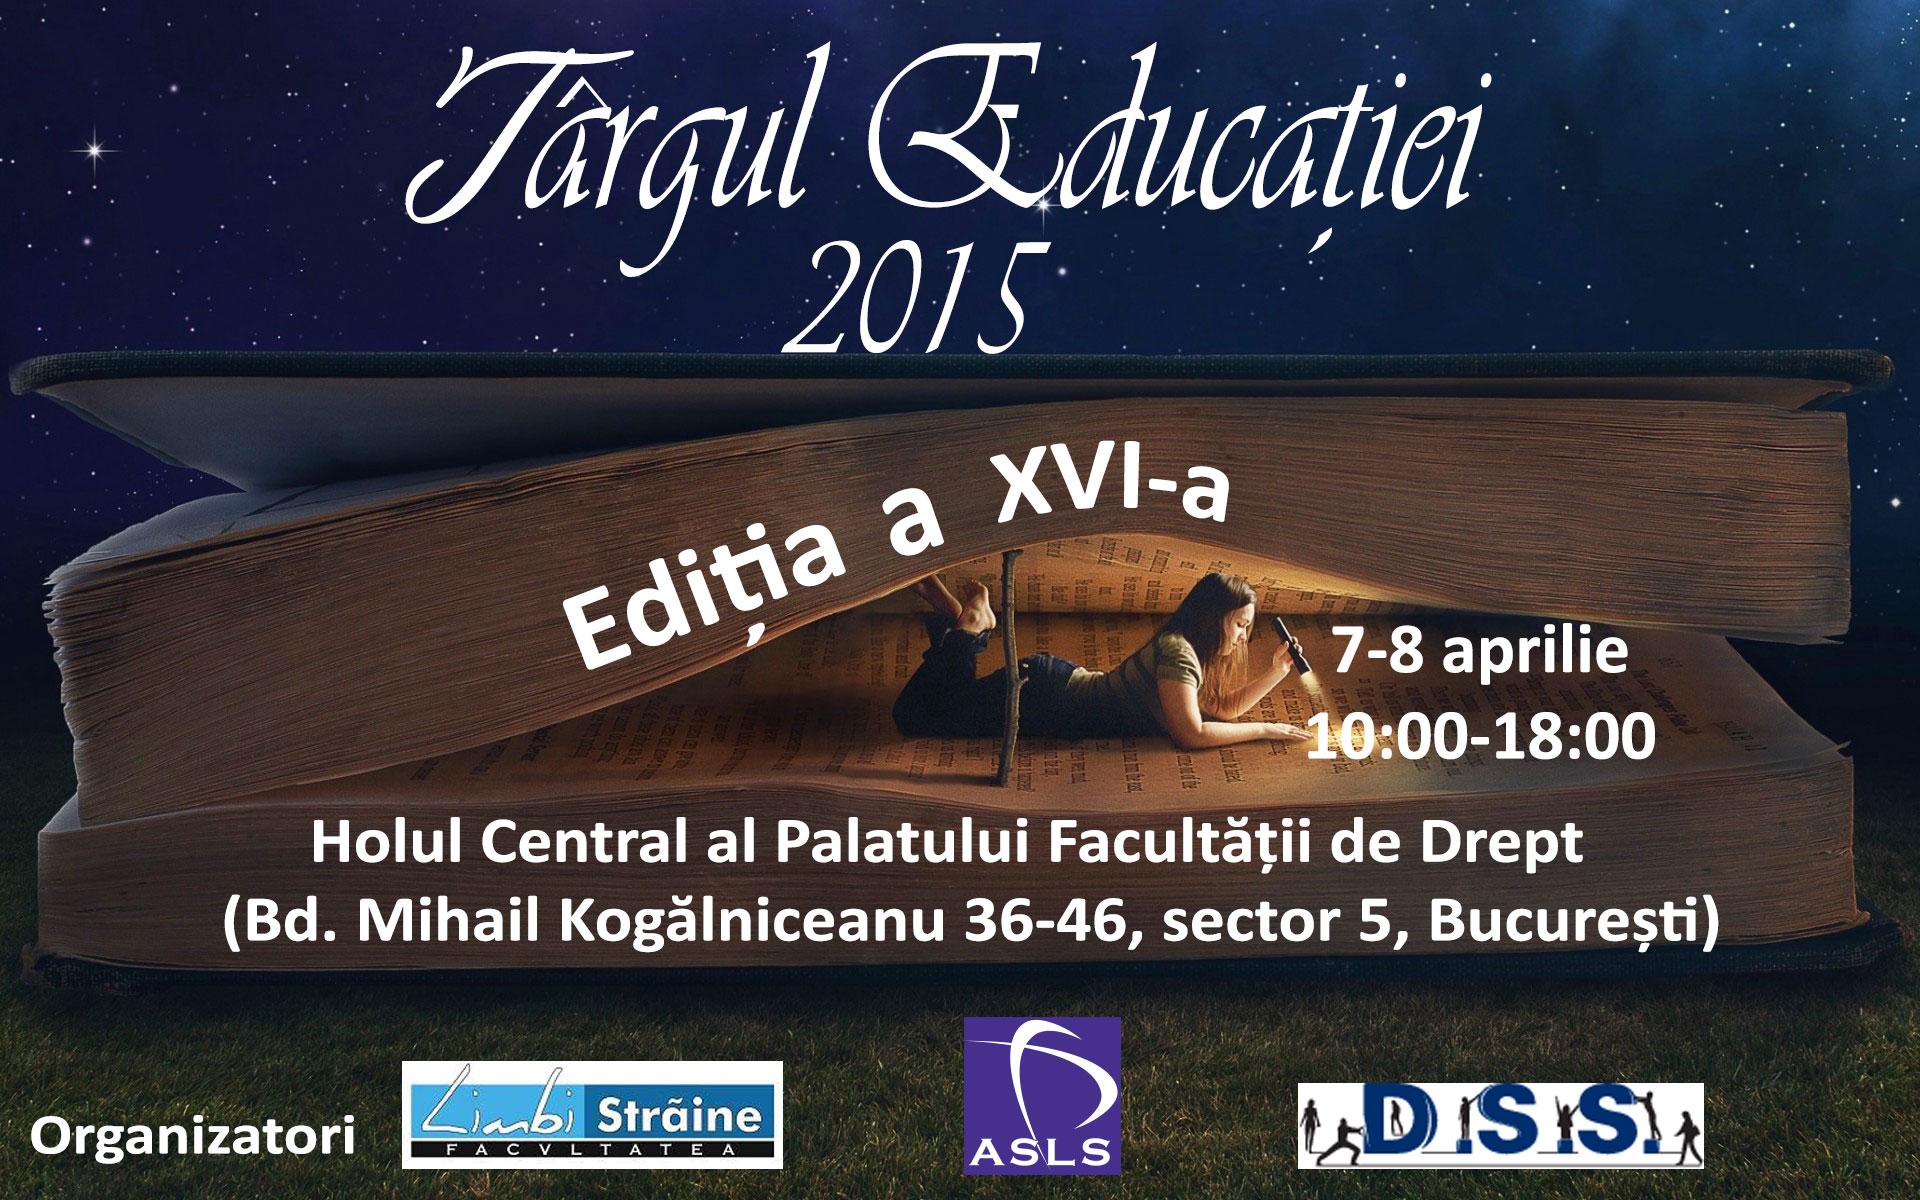 Târgul Educației 2015